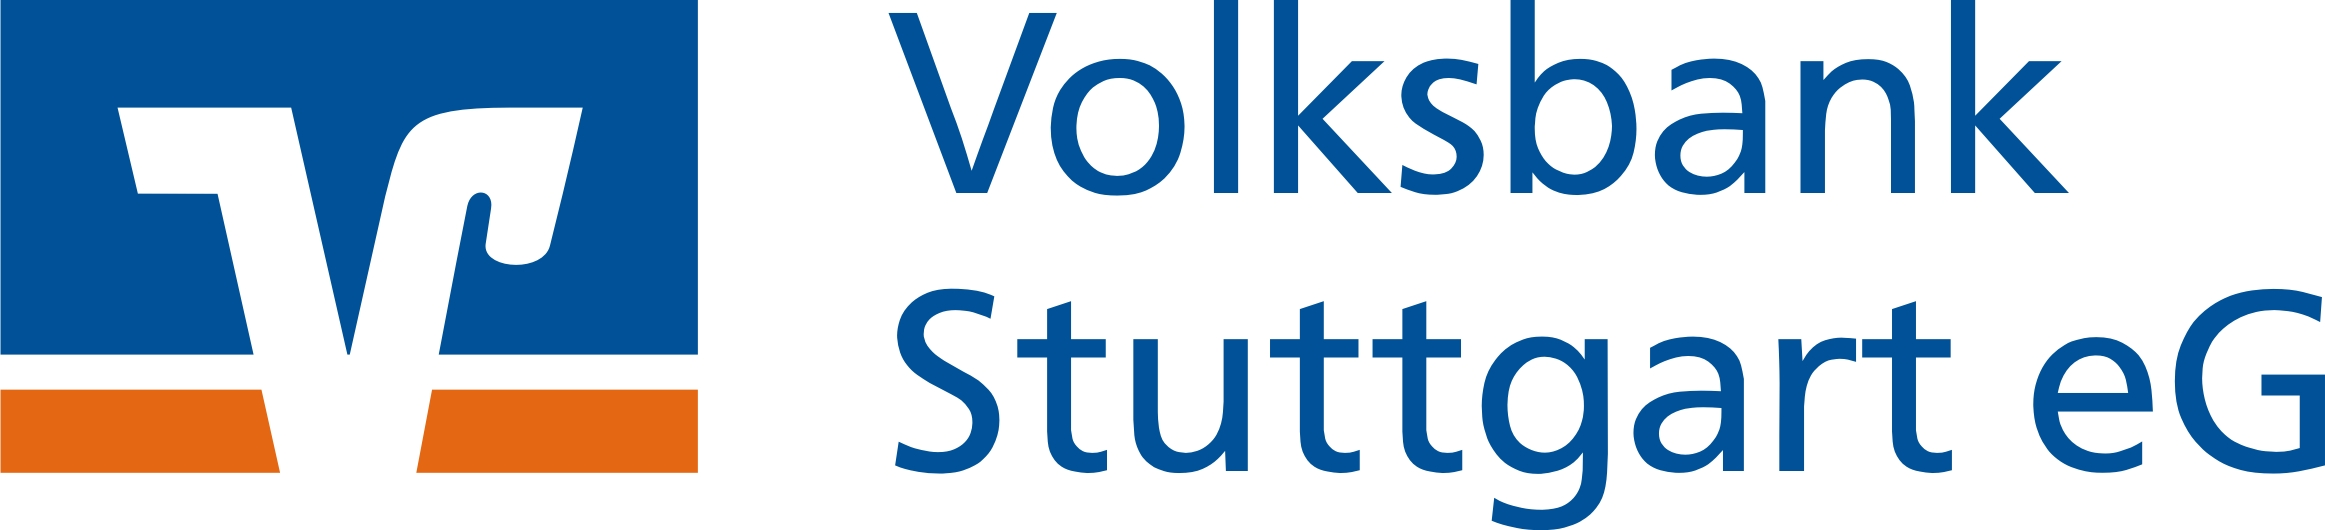 Logog der Volksbank Suttgart eG